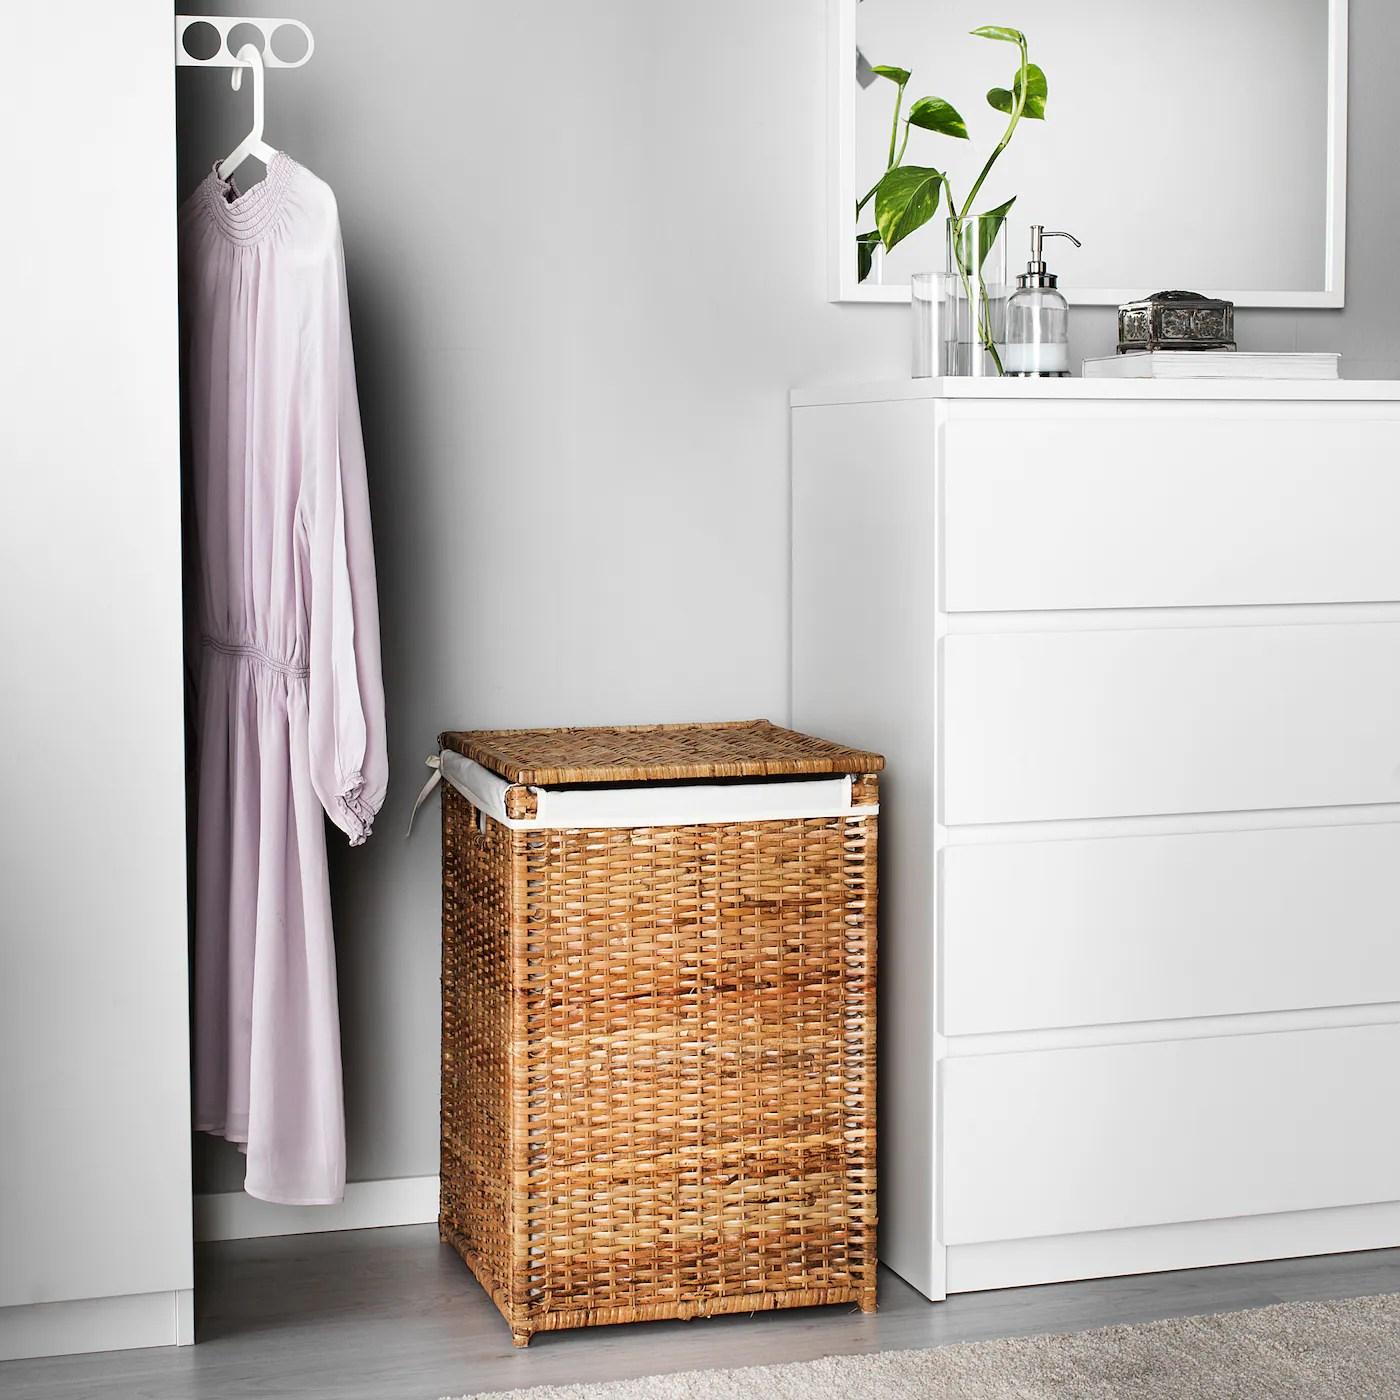 Branas Panier A Linge Interieur Tissu Rotin Ikea